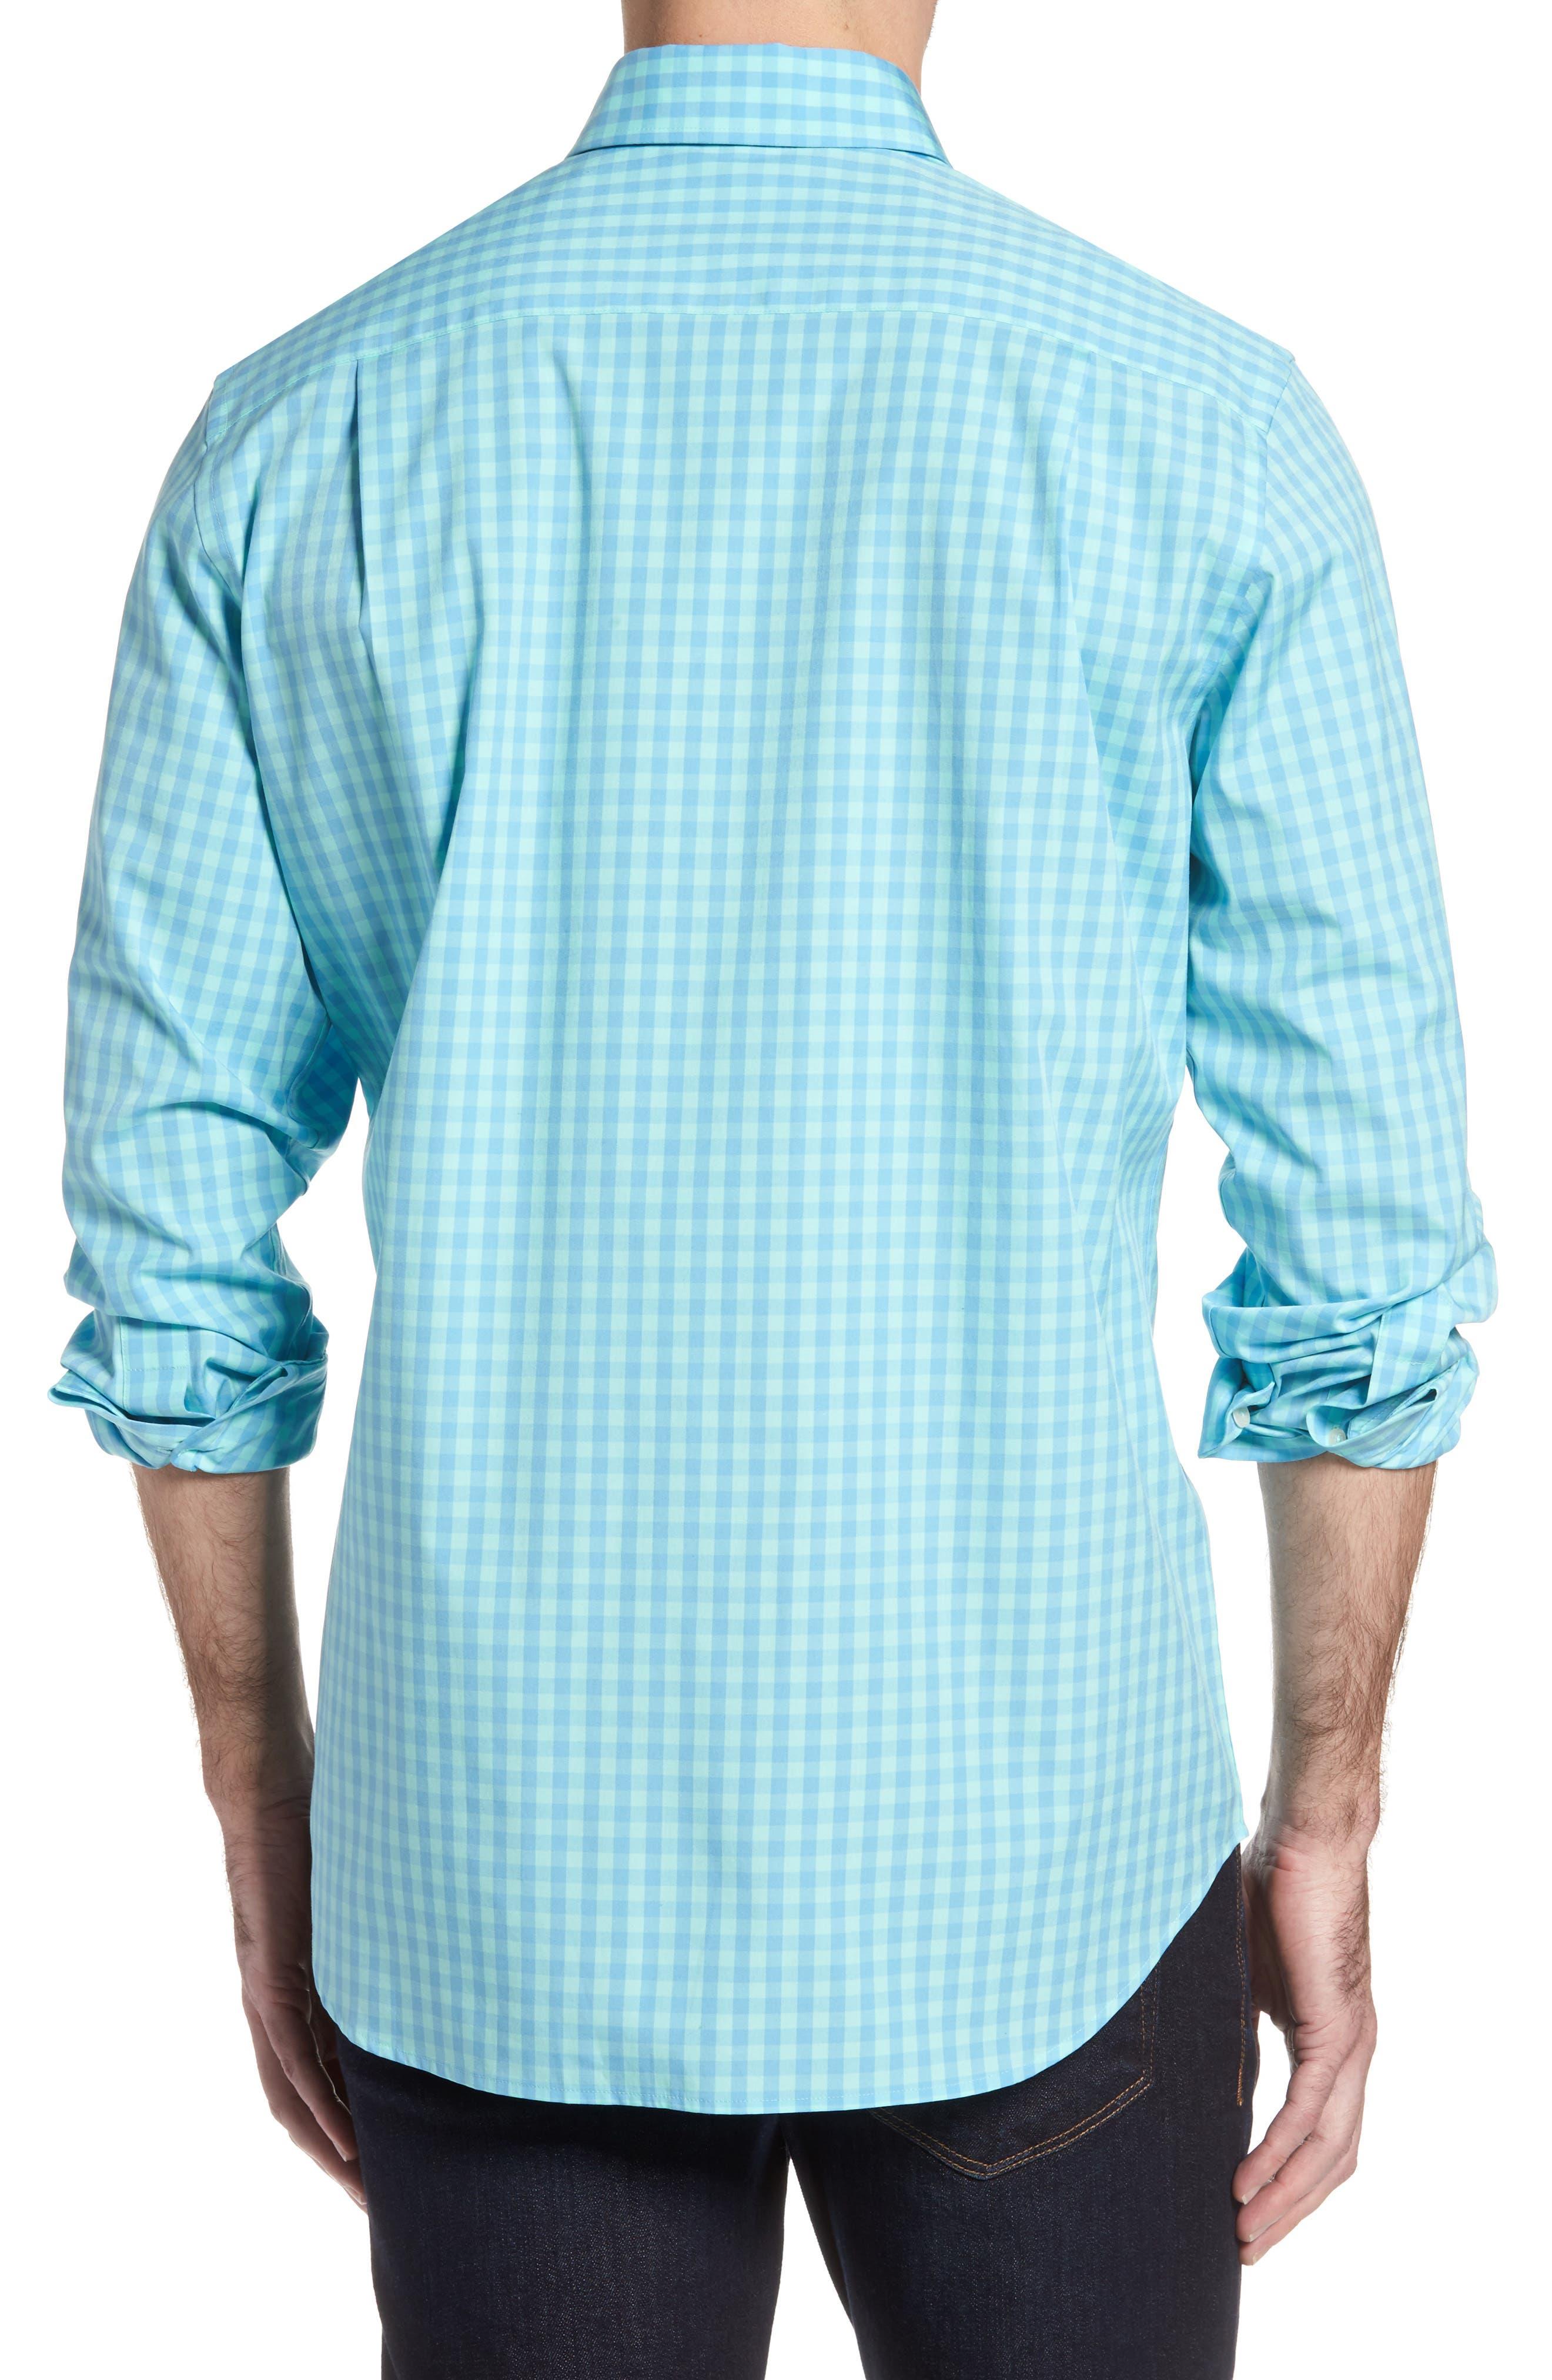 Getaway Gingham Classic Fit Sport Shirt,                             Alternate thumbnail 2, color,                             476